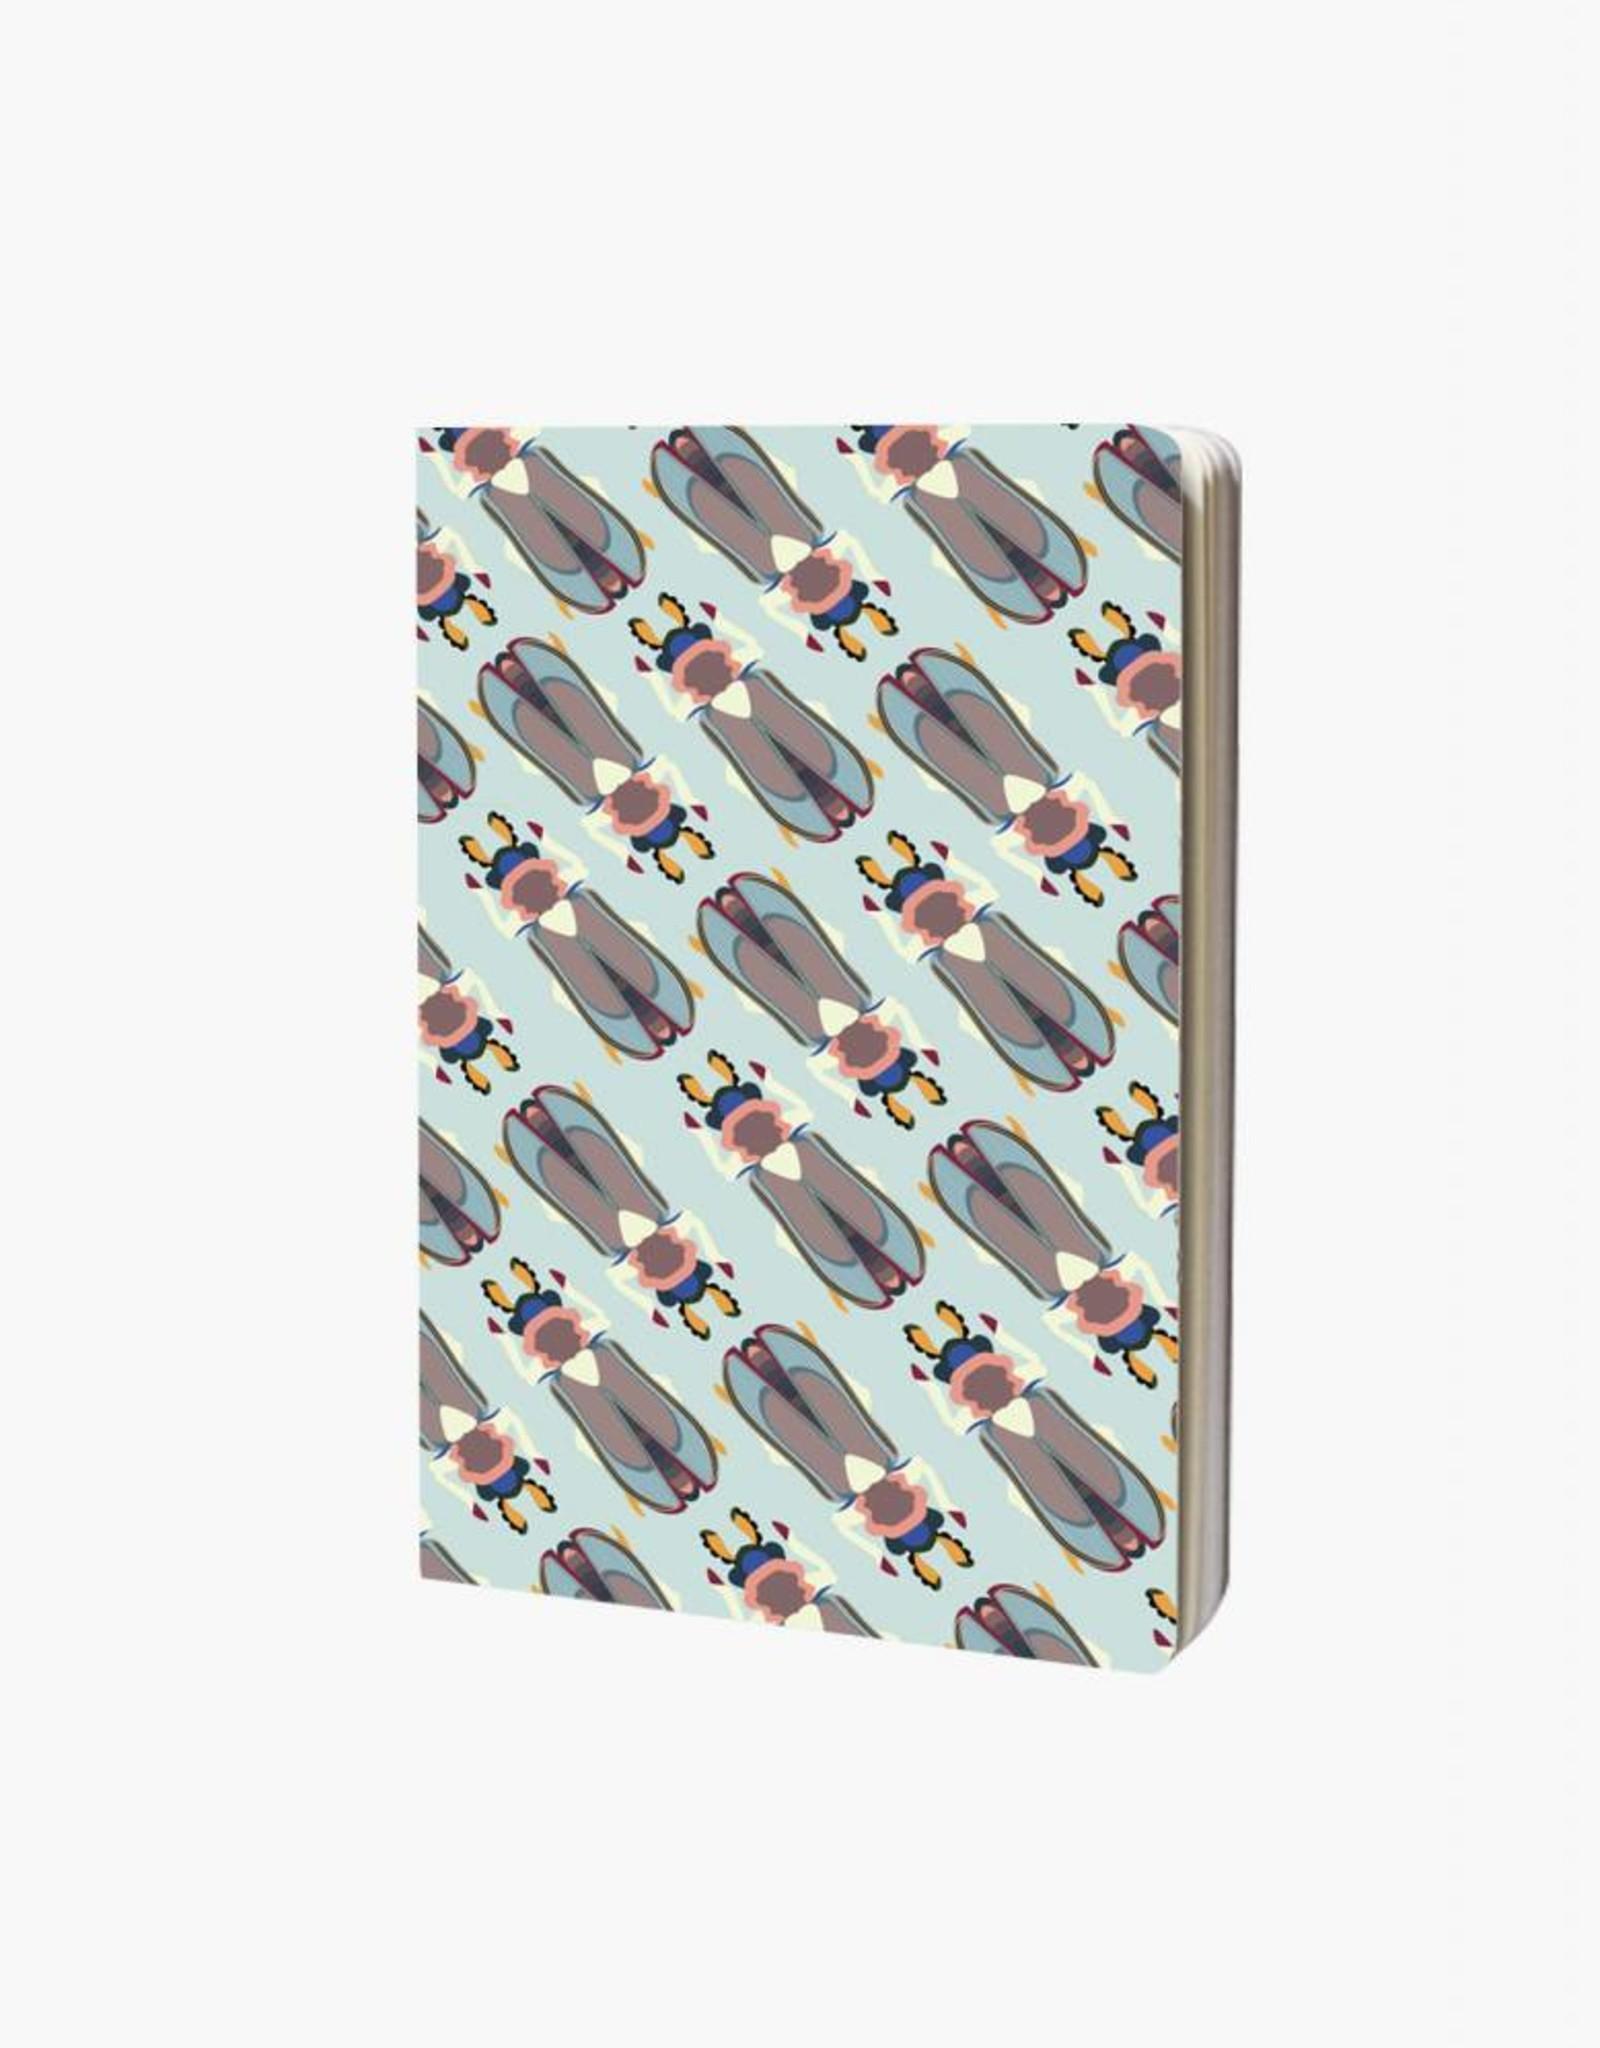 Studioroof Studioroof Notebook A6 Tiger Beetle